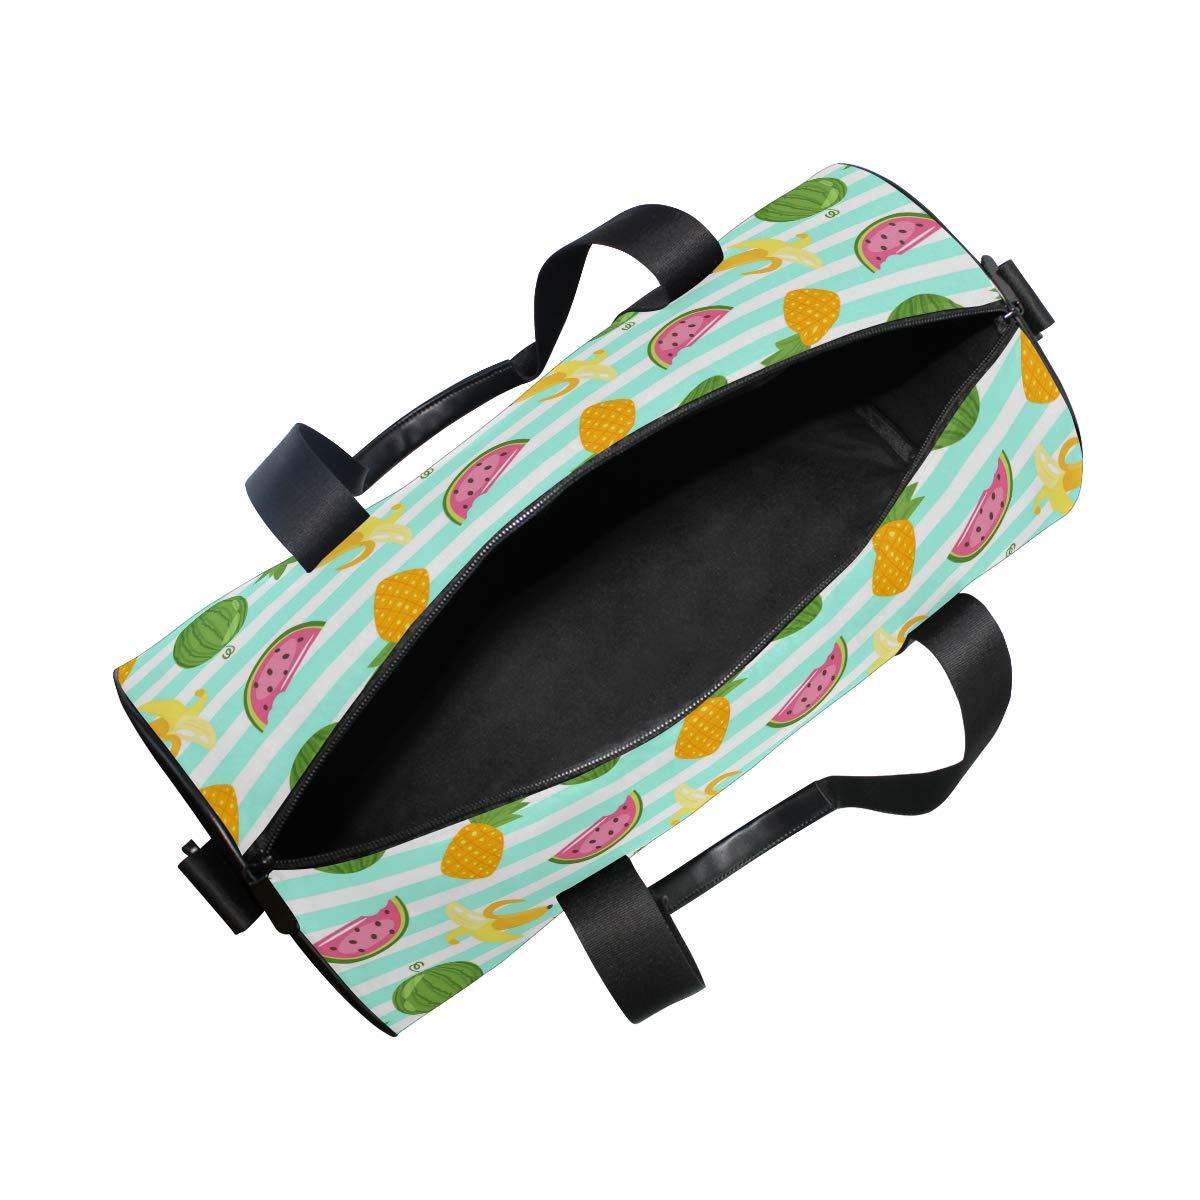 Waterproof Non-Slip Wearable Crossbody Bag fitness bag Shoulder Bag Vitex Fruit Picture